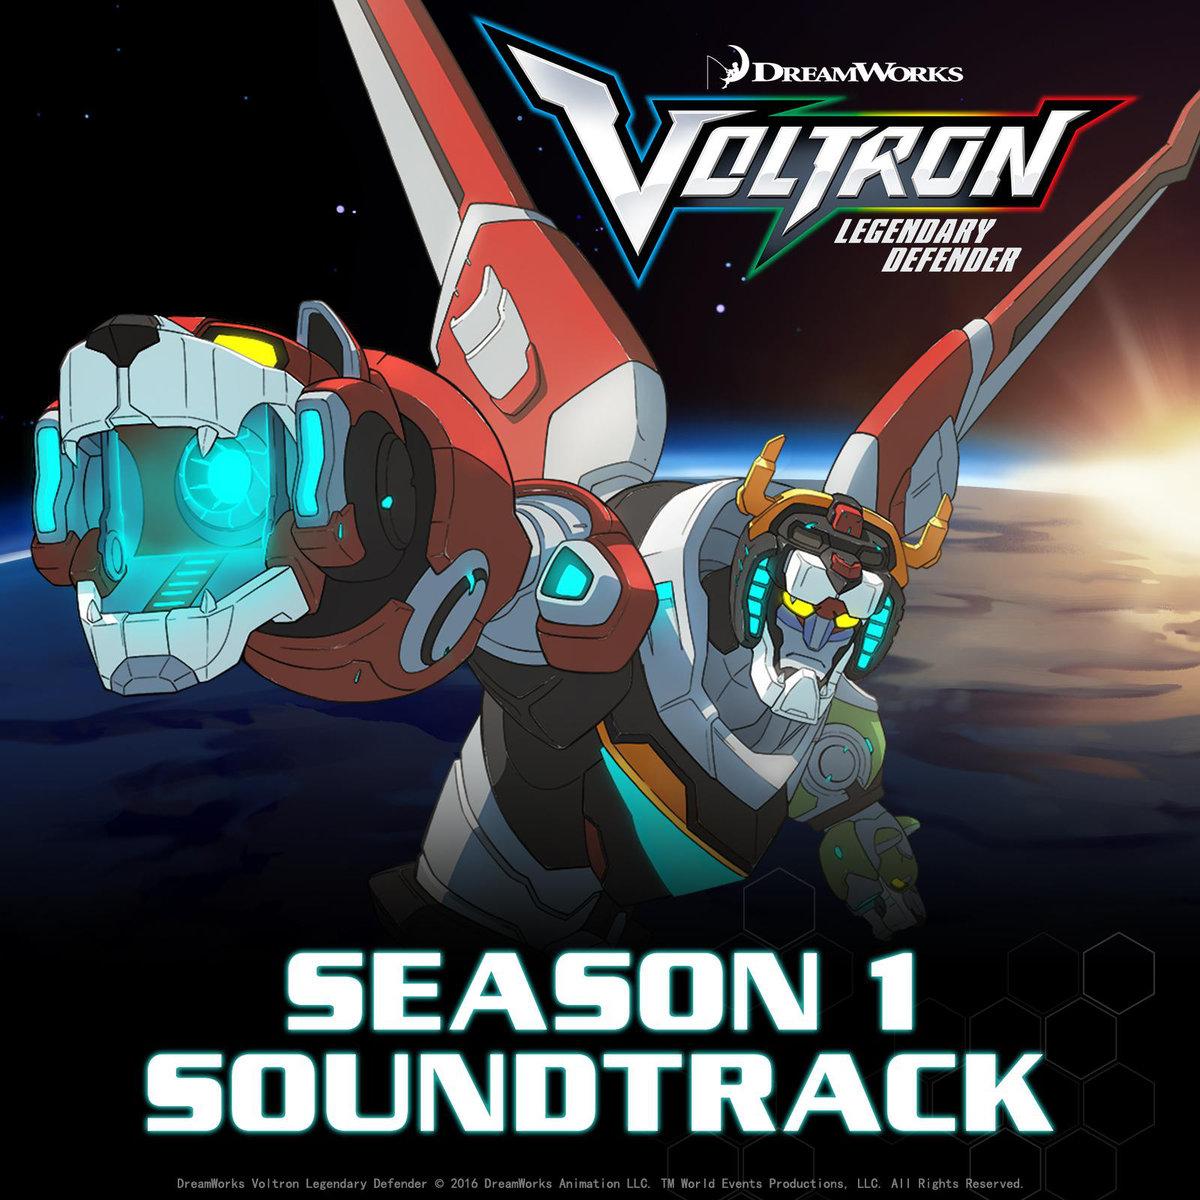 voltron legendary defender season 4 episode 3 download